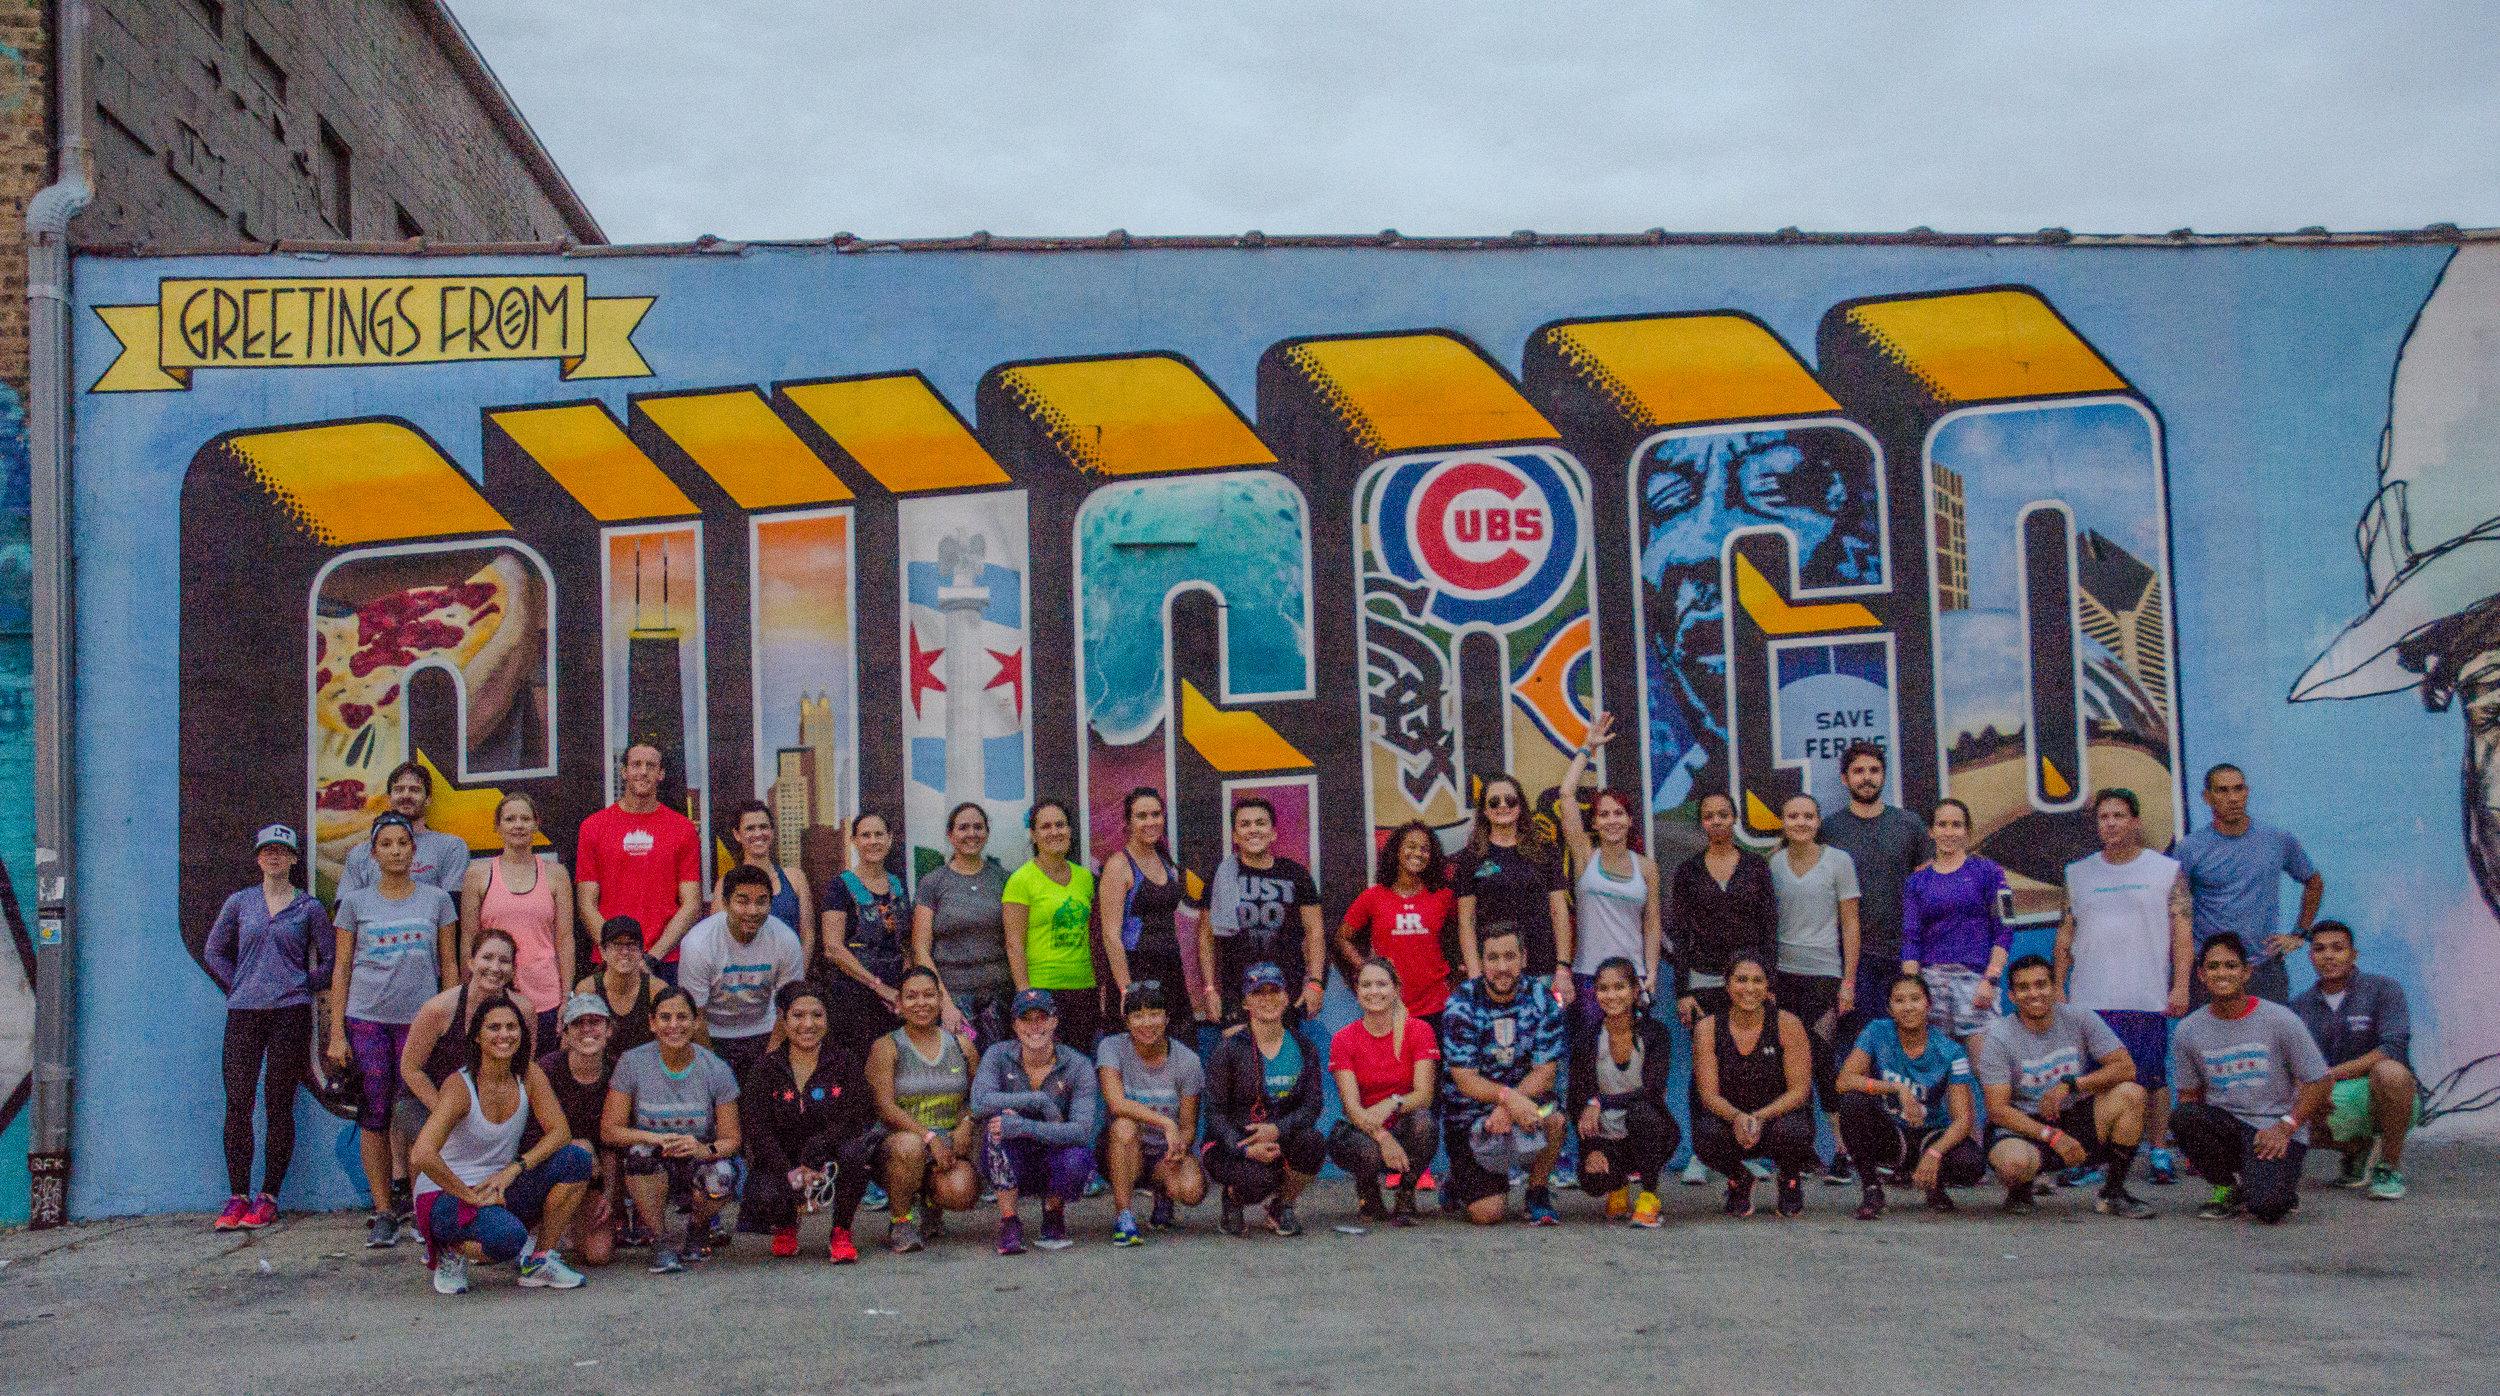 Runstreet X Saucony Chicago Art Run 10.6-4547.jpg